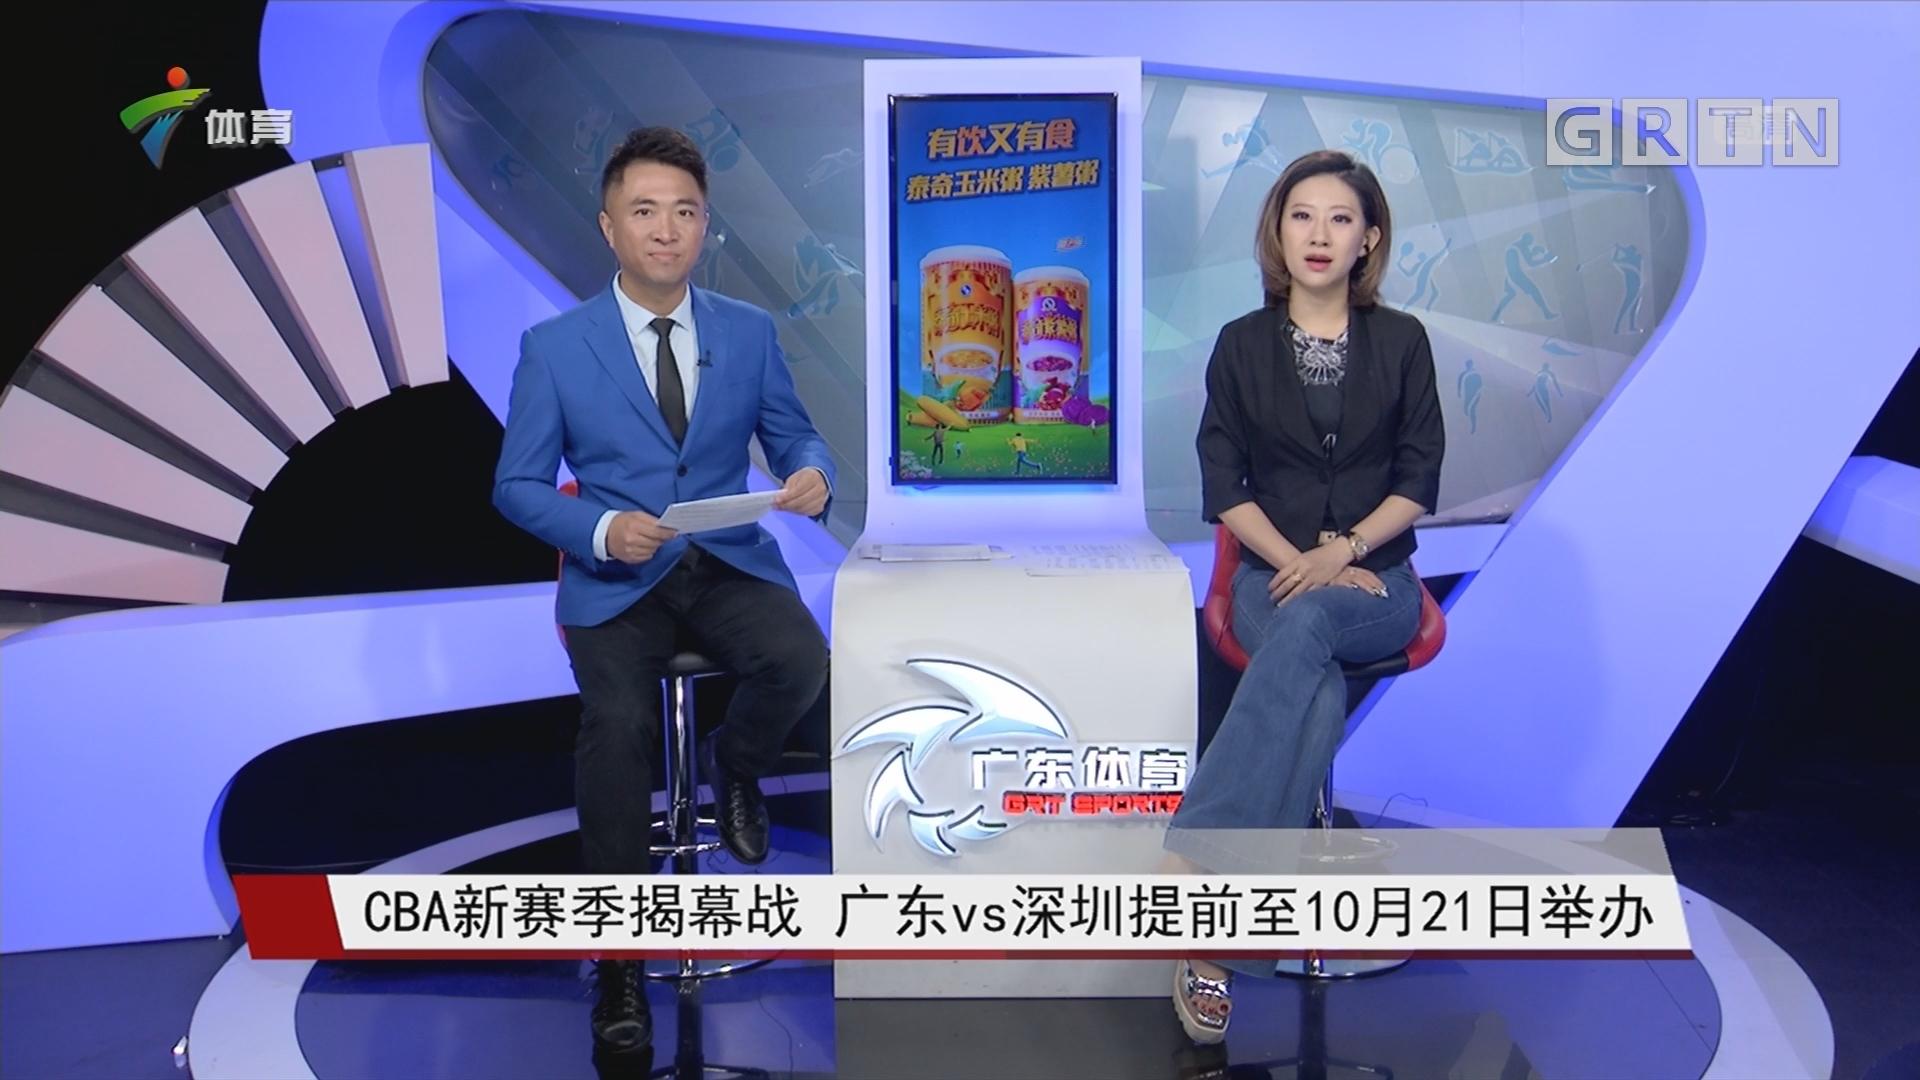 CBA新赛季揭幕战 广东vs深圳提前至10月21日举办